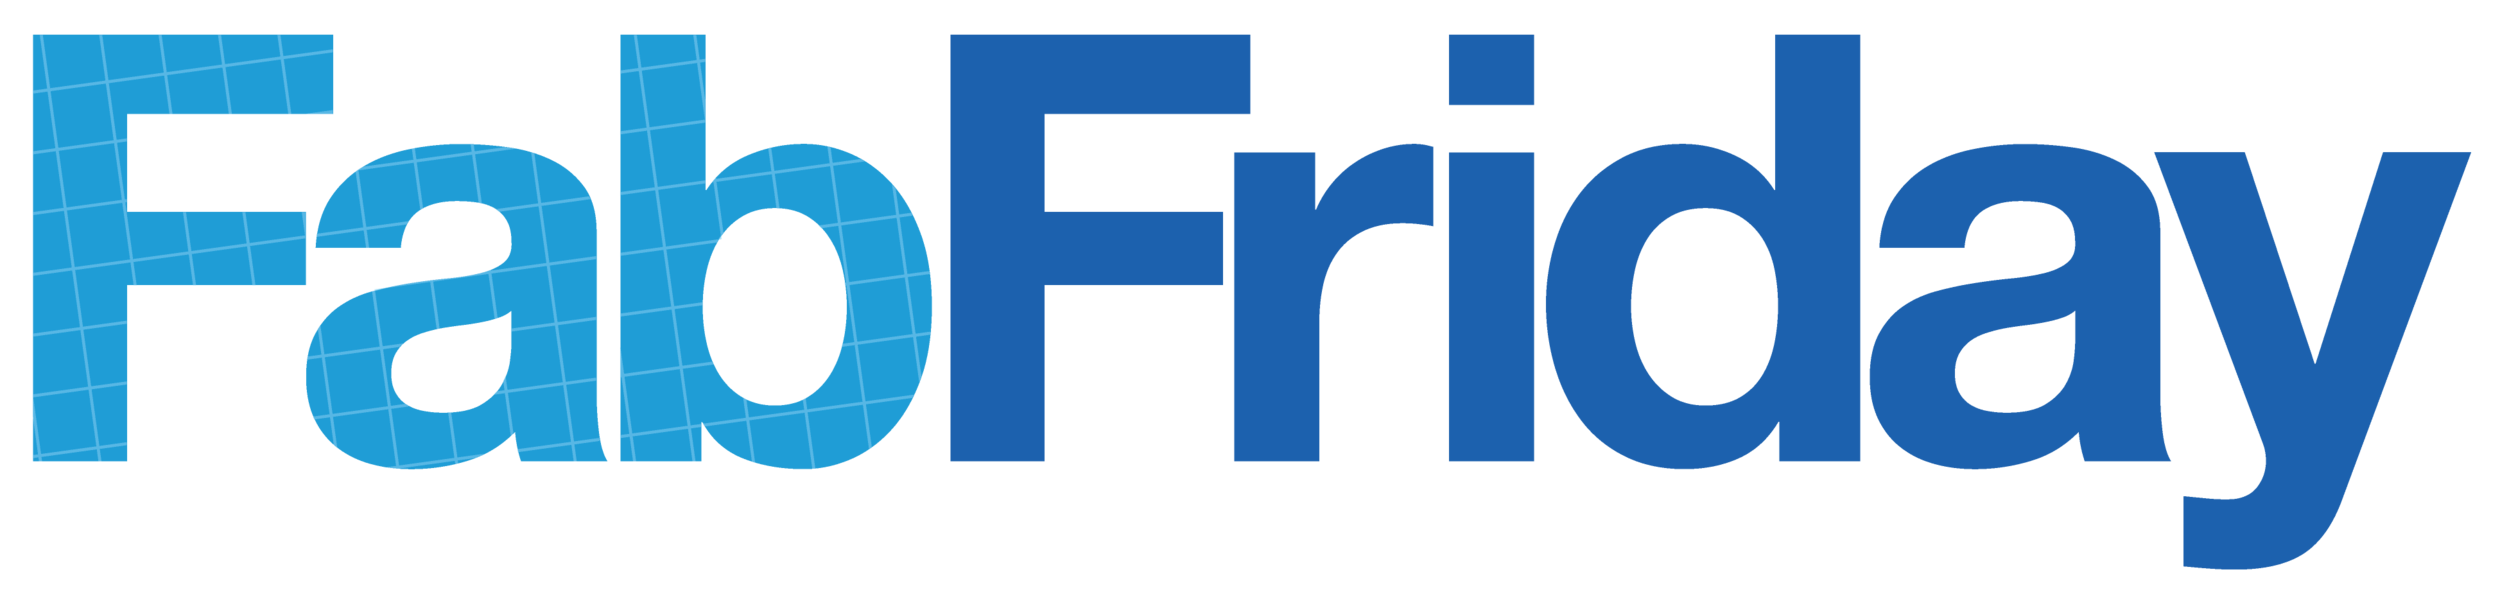 FabFriday_Logo-01.png